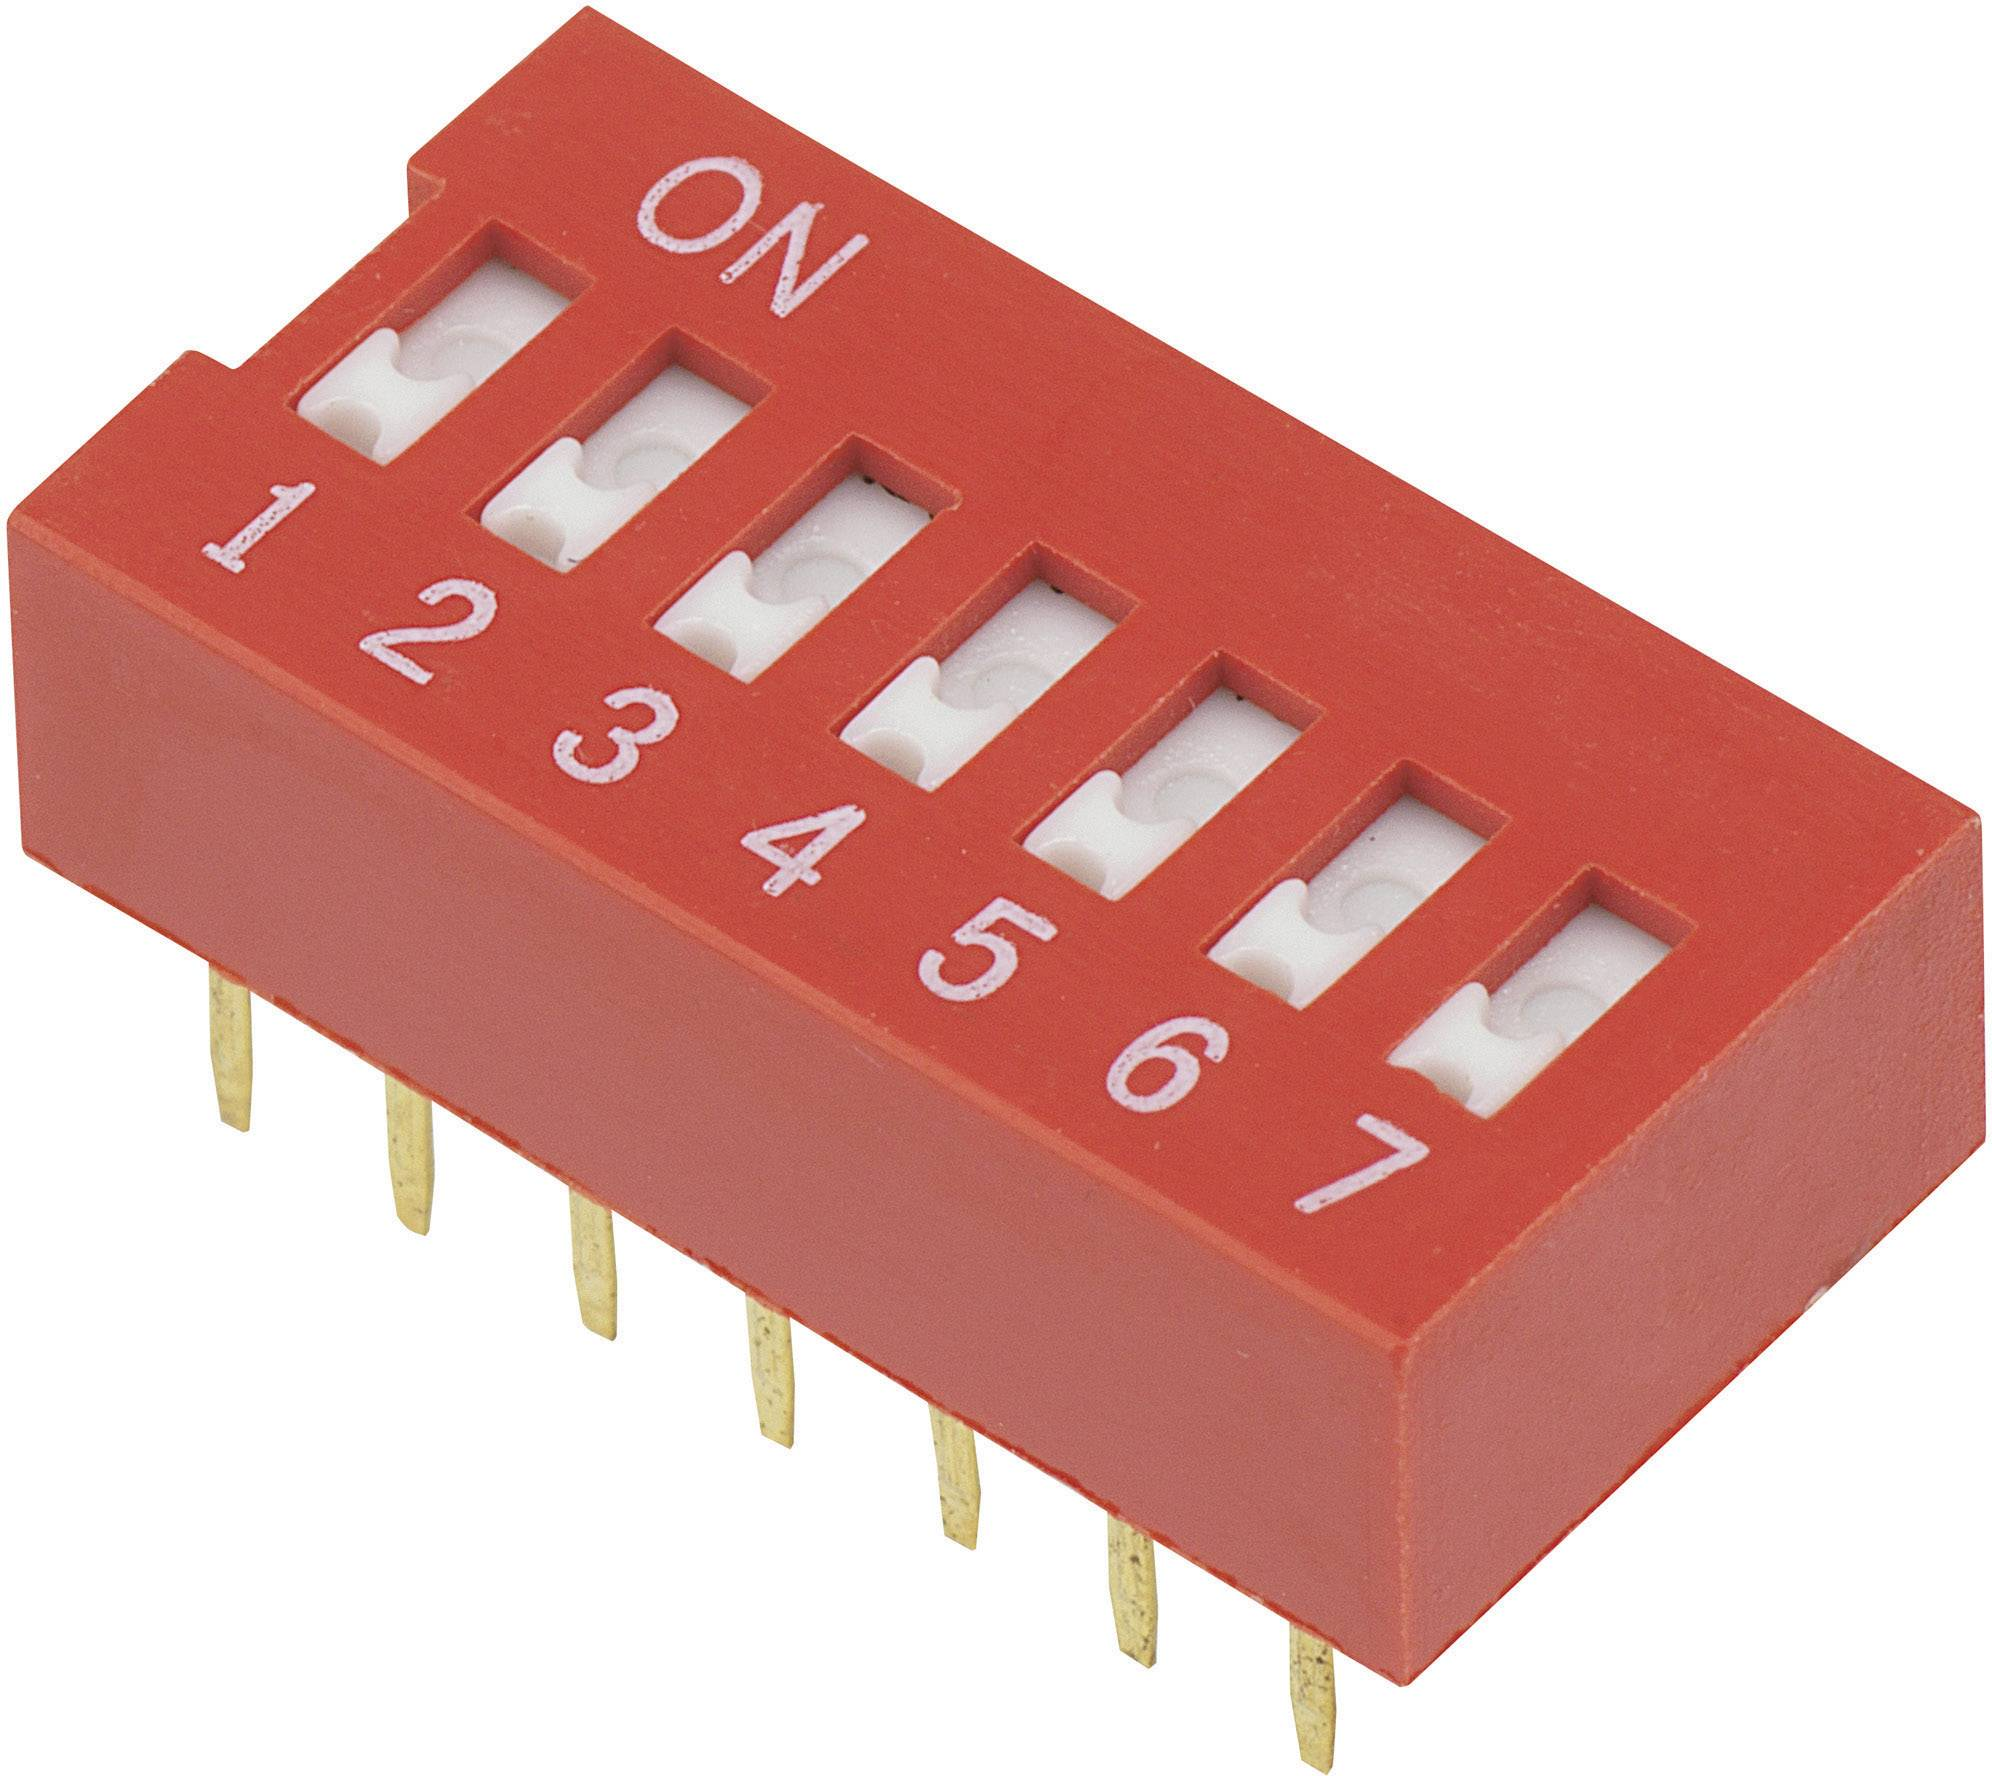 DIP spínač DSR-07, (š x v) 9,9 mm x 5,7 mm